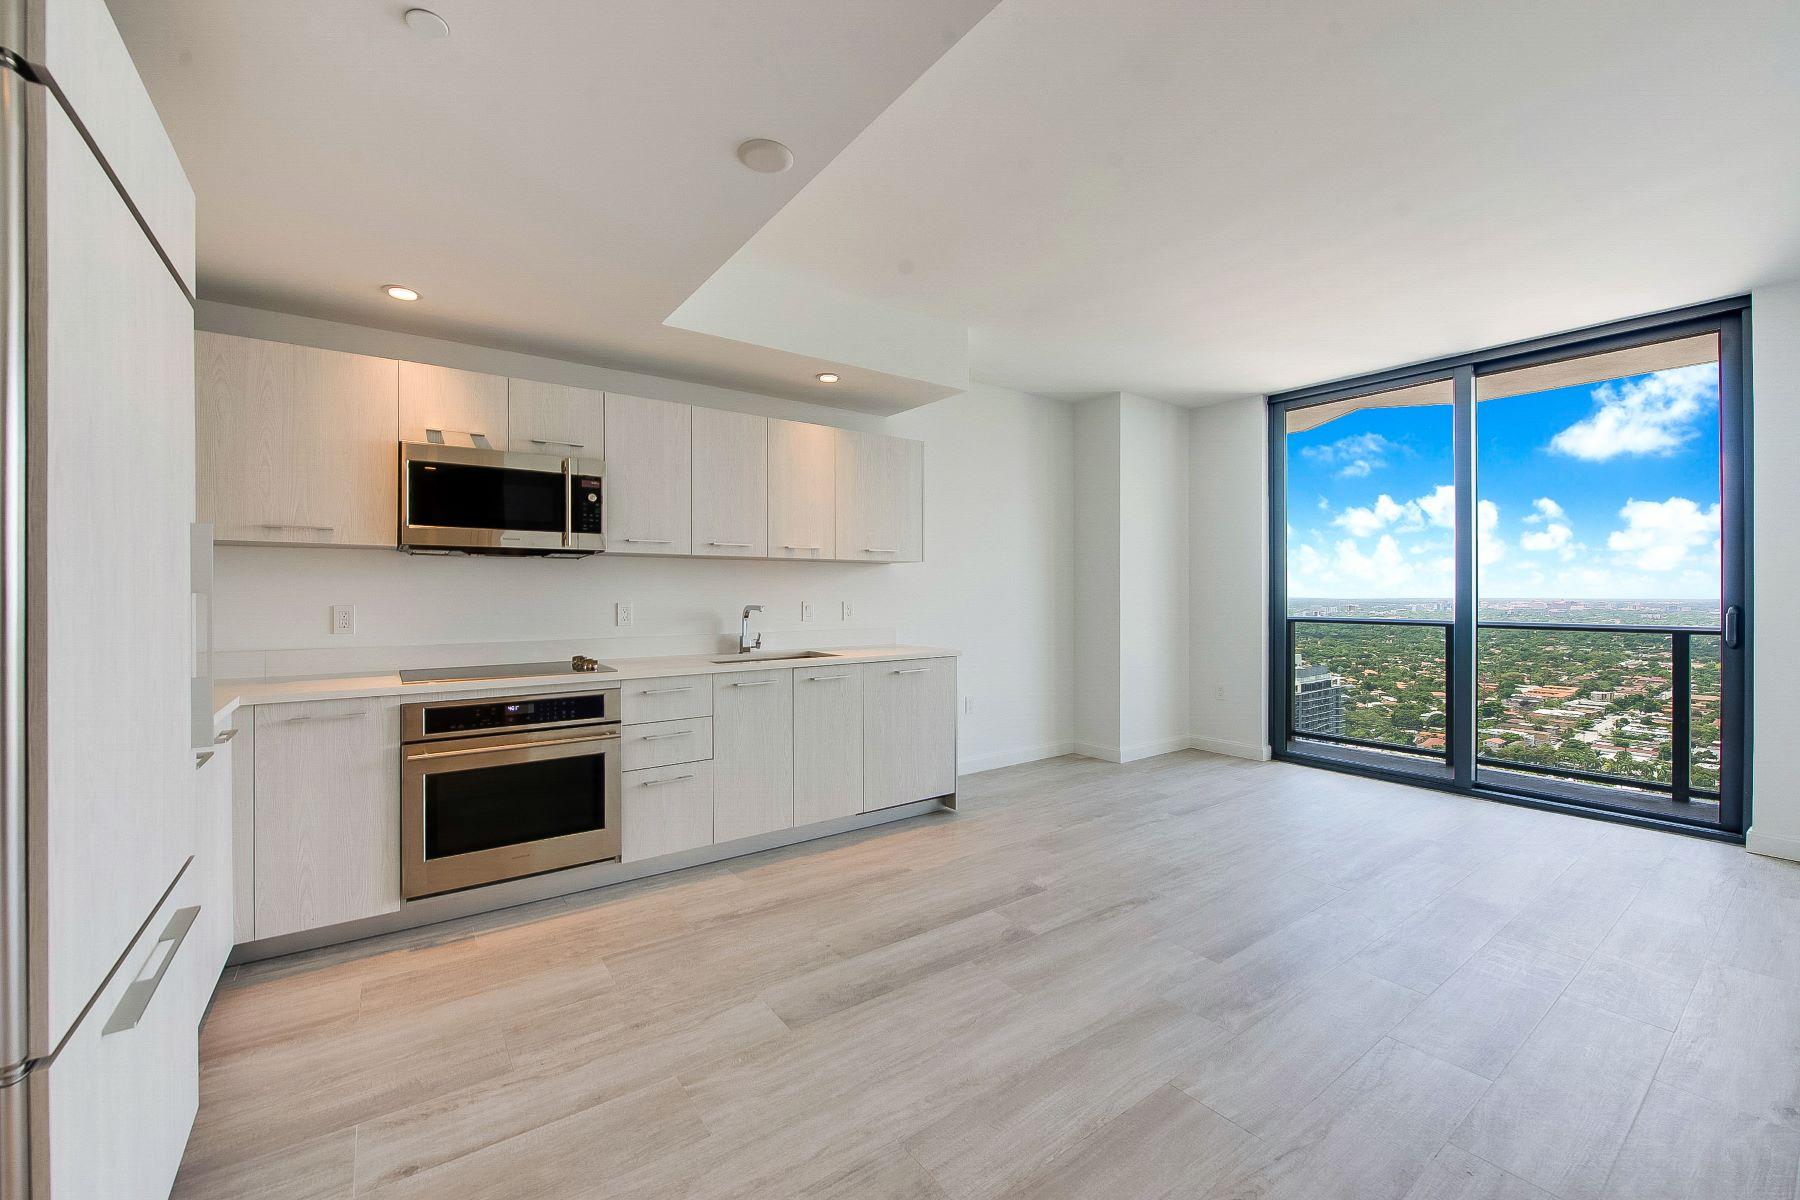 Condominium for Sale at 55 Sw 9th 55 Sw9th 3607 Miami, Florida, 33130 United States